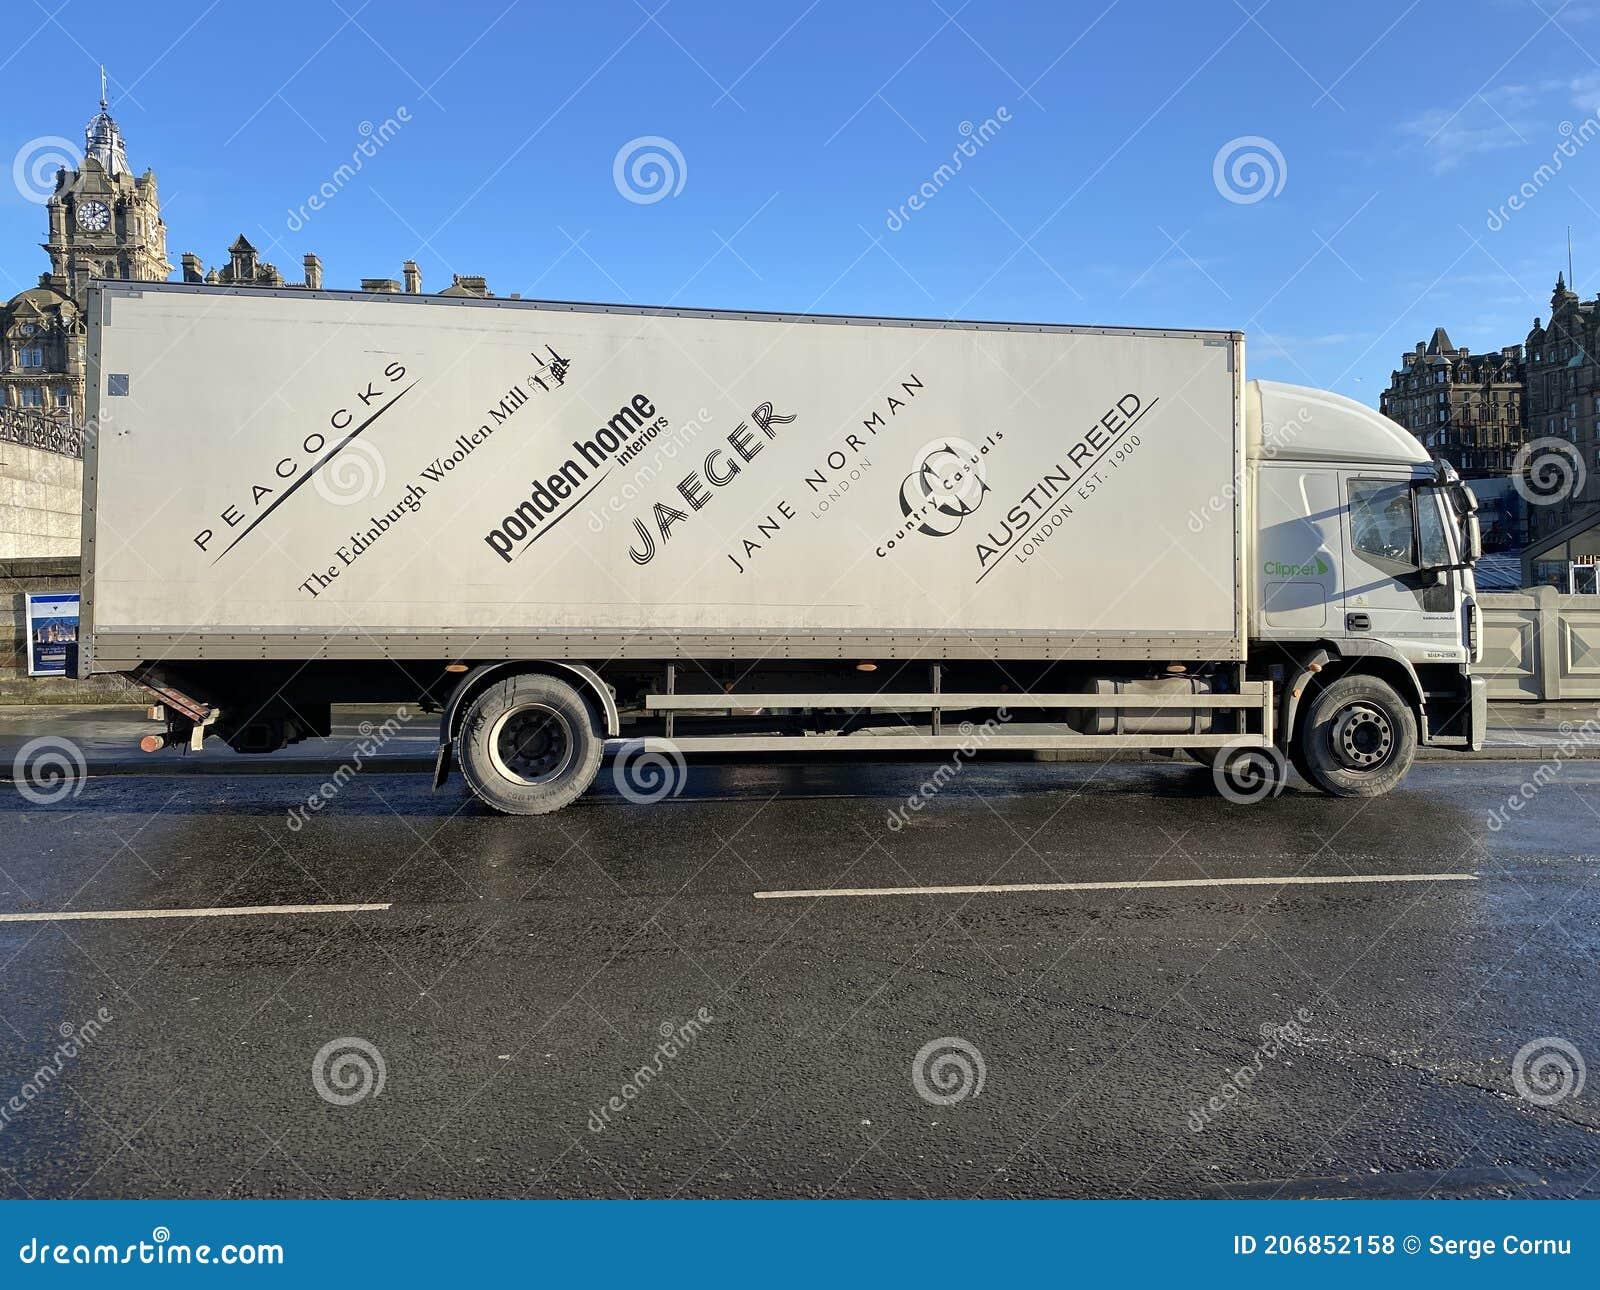 Edinburgh Woollen Mill Lorry Parked On The Street Editorial Stock Photo Image Of Finance Jaeger 206852158